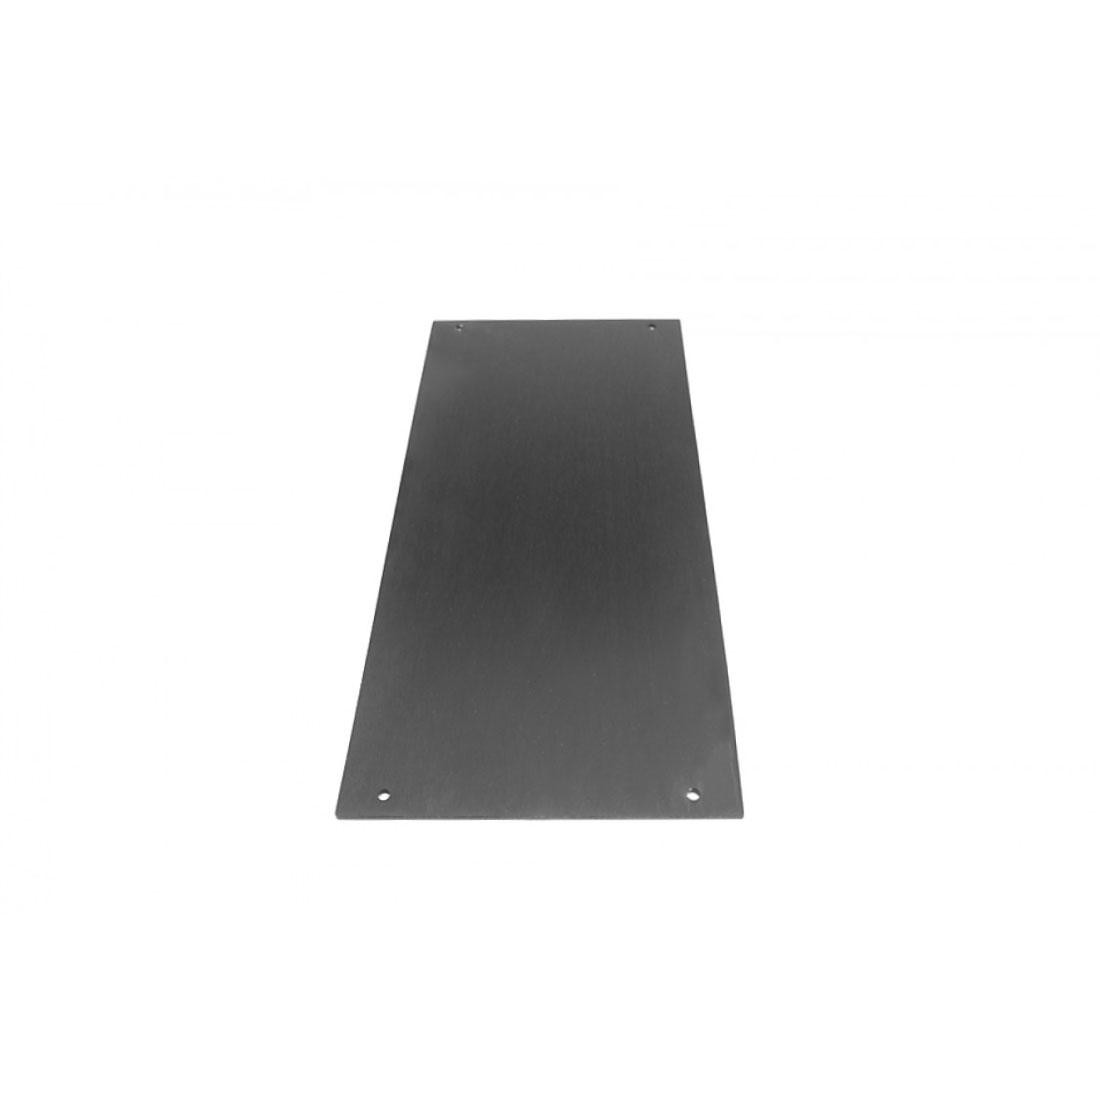 1NPDA04300B - 4U Krabice s chladičem, 300mm, 10mm-panel stříbrný, AL víka